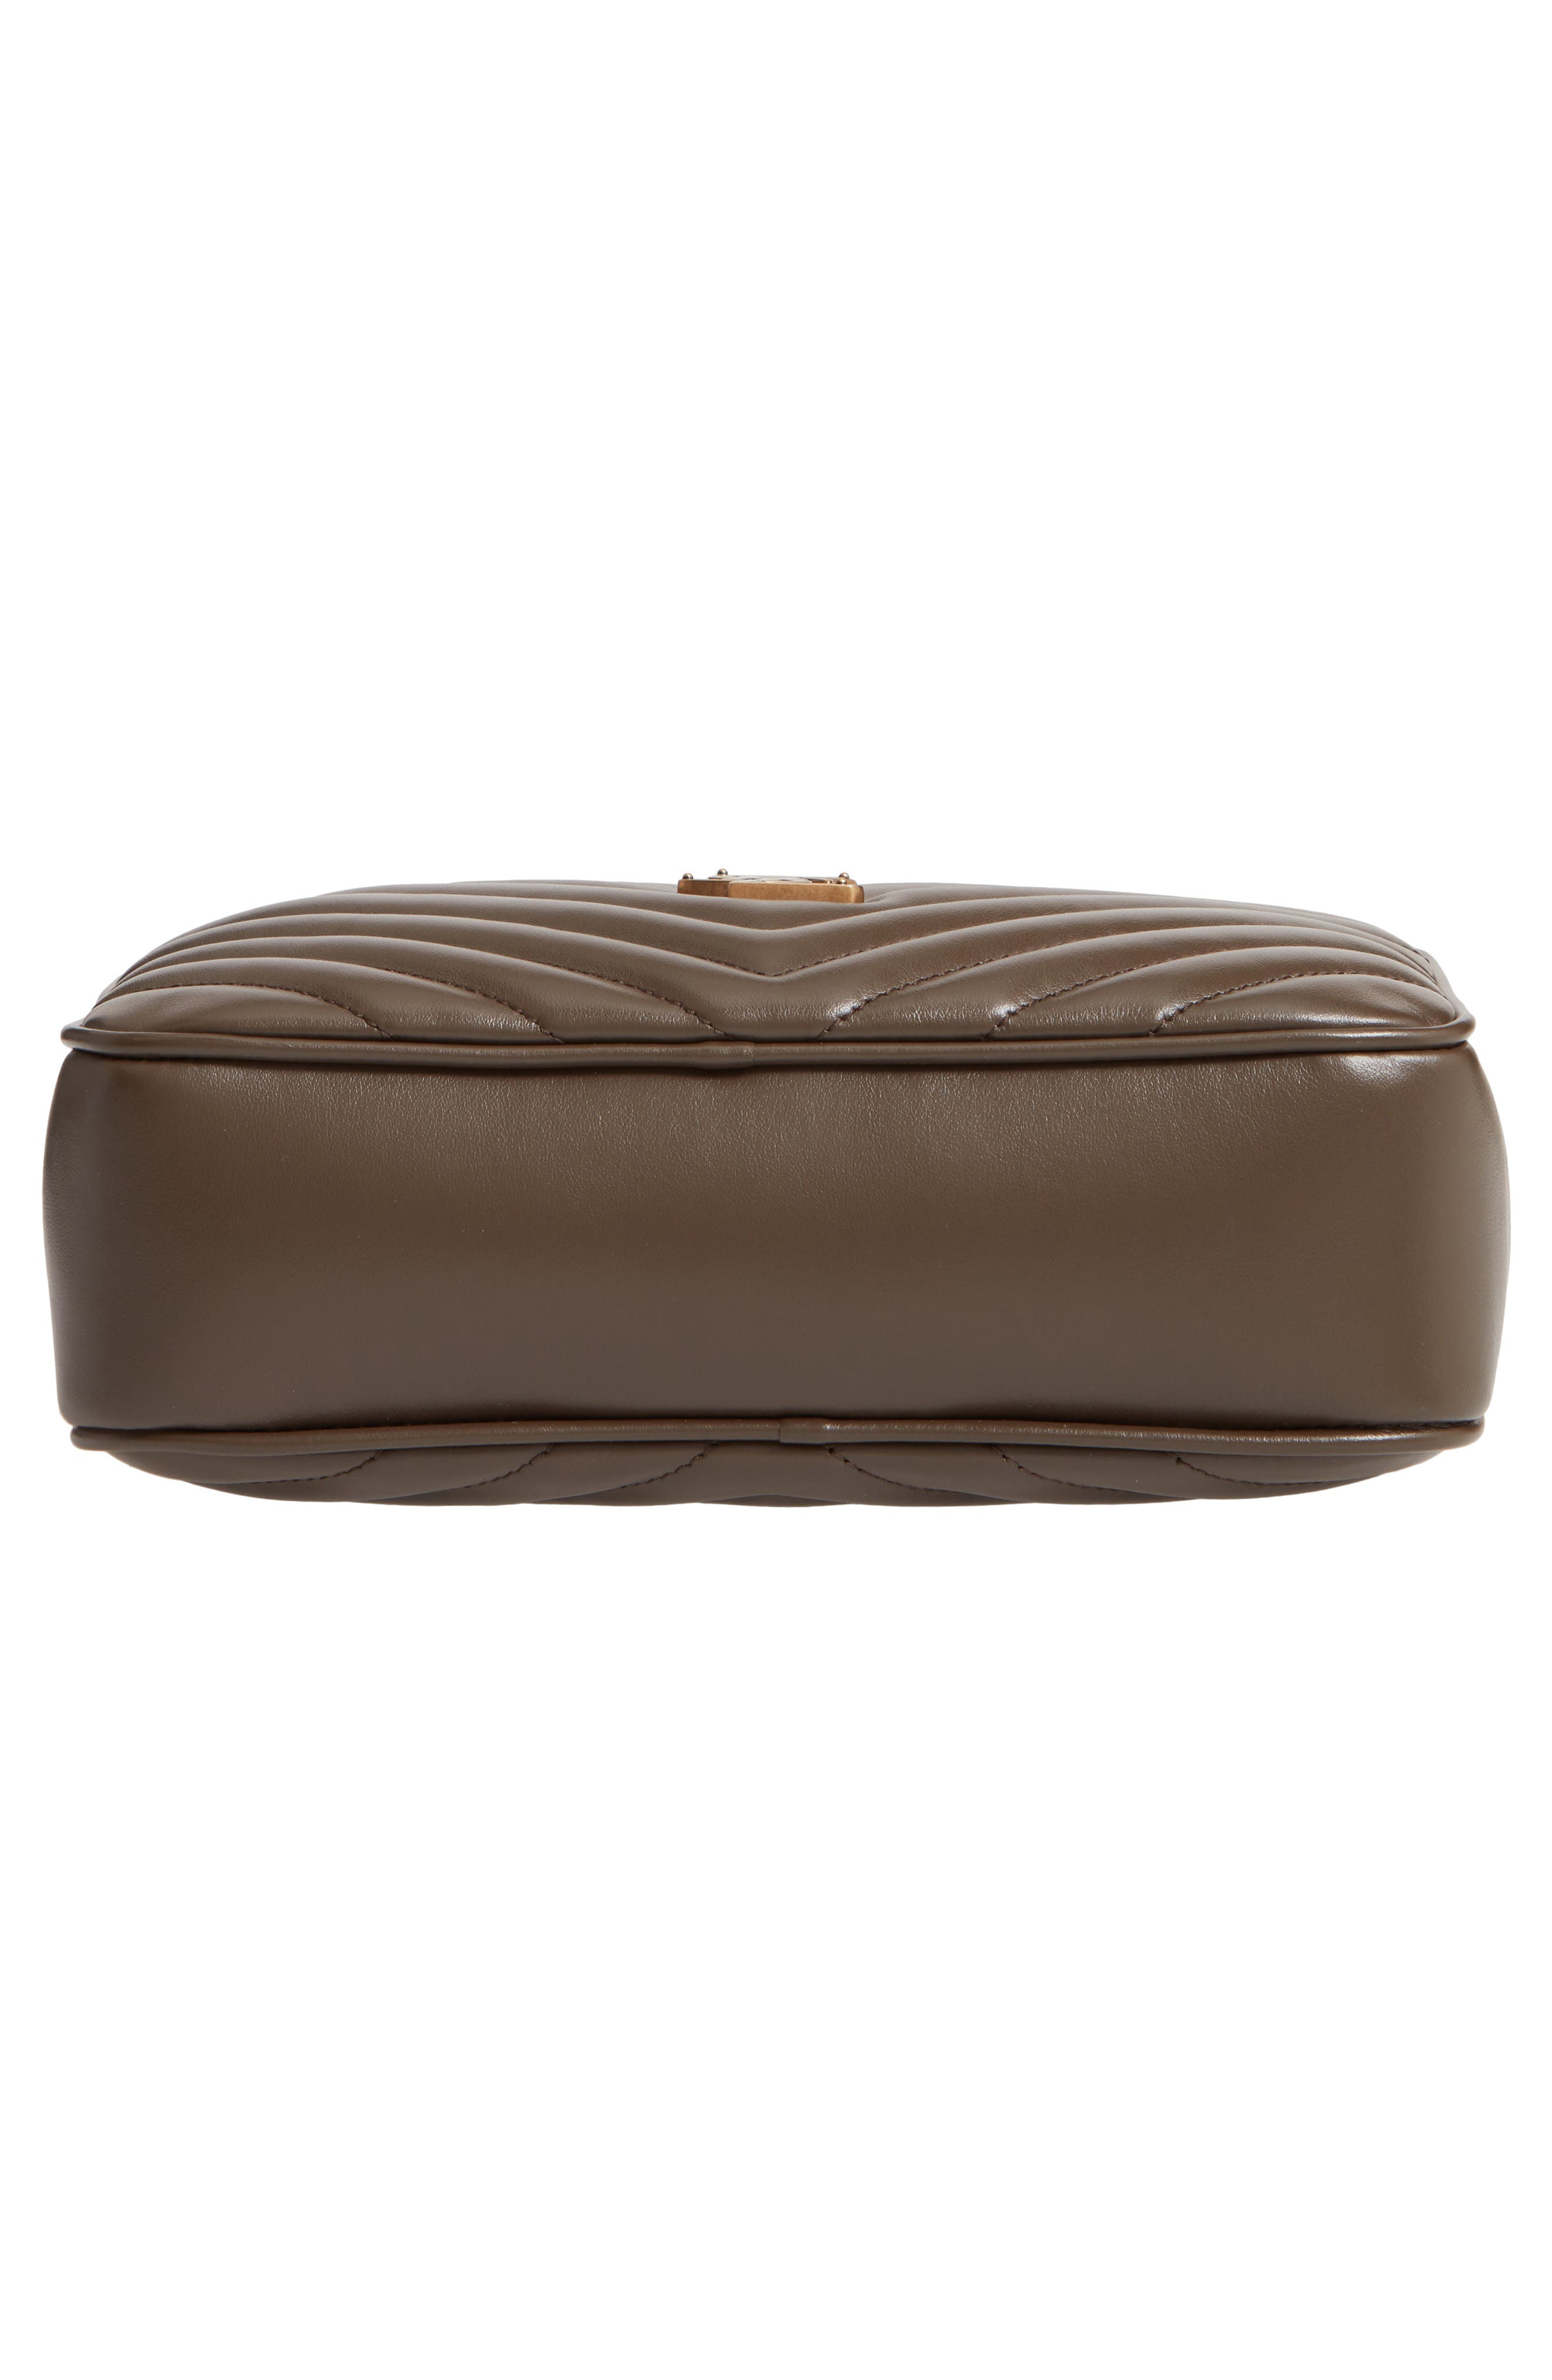 Medium Lou Calfskin Leather Camera Bag,                             Alternate thumbnail 6, color,                             200